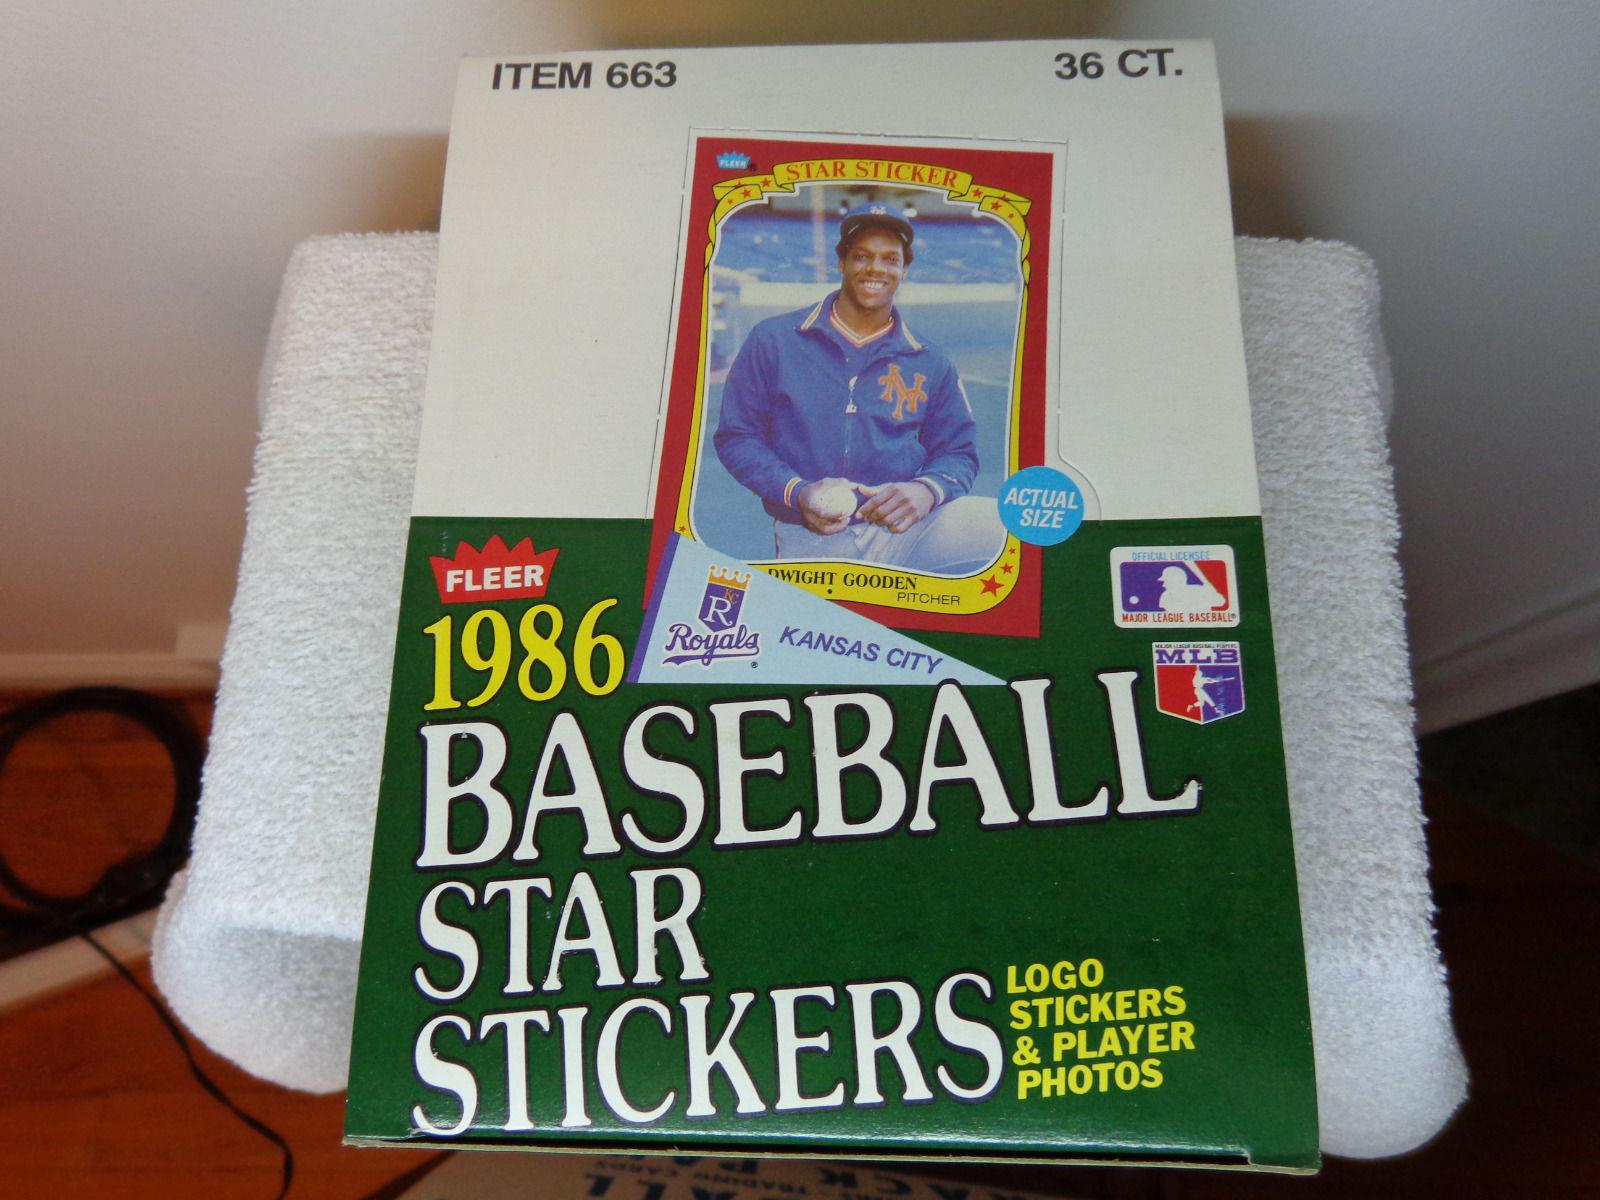 1986 Fleer Star Stickers Unopened Wax Box